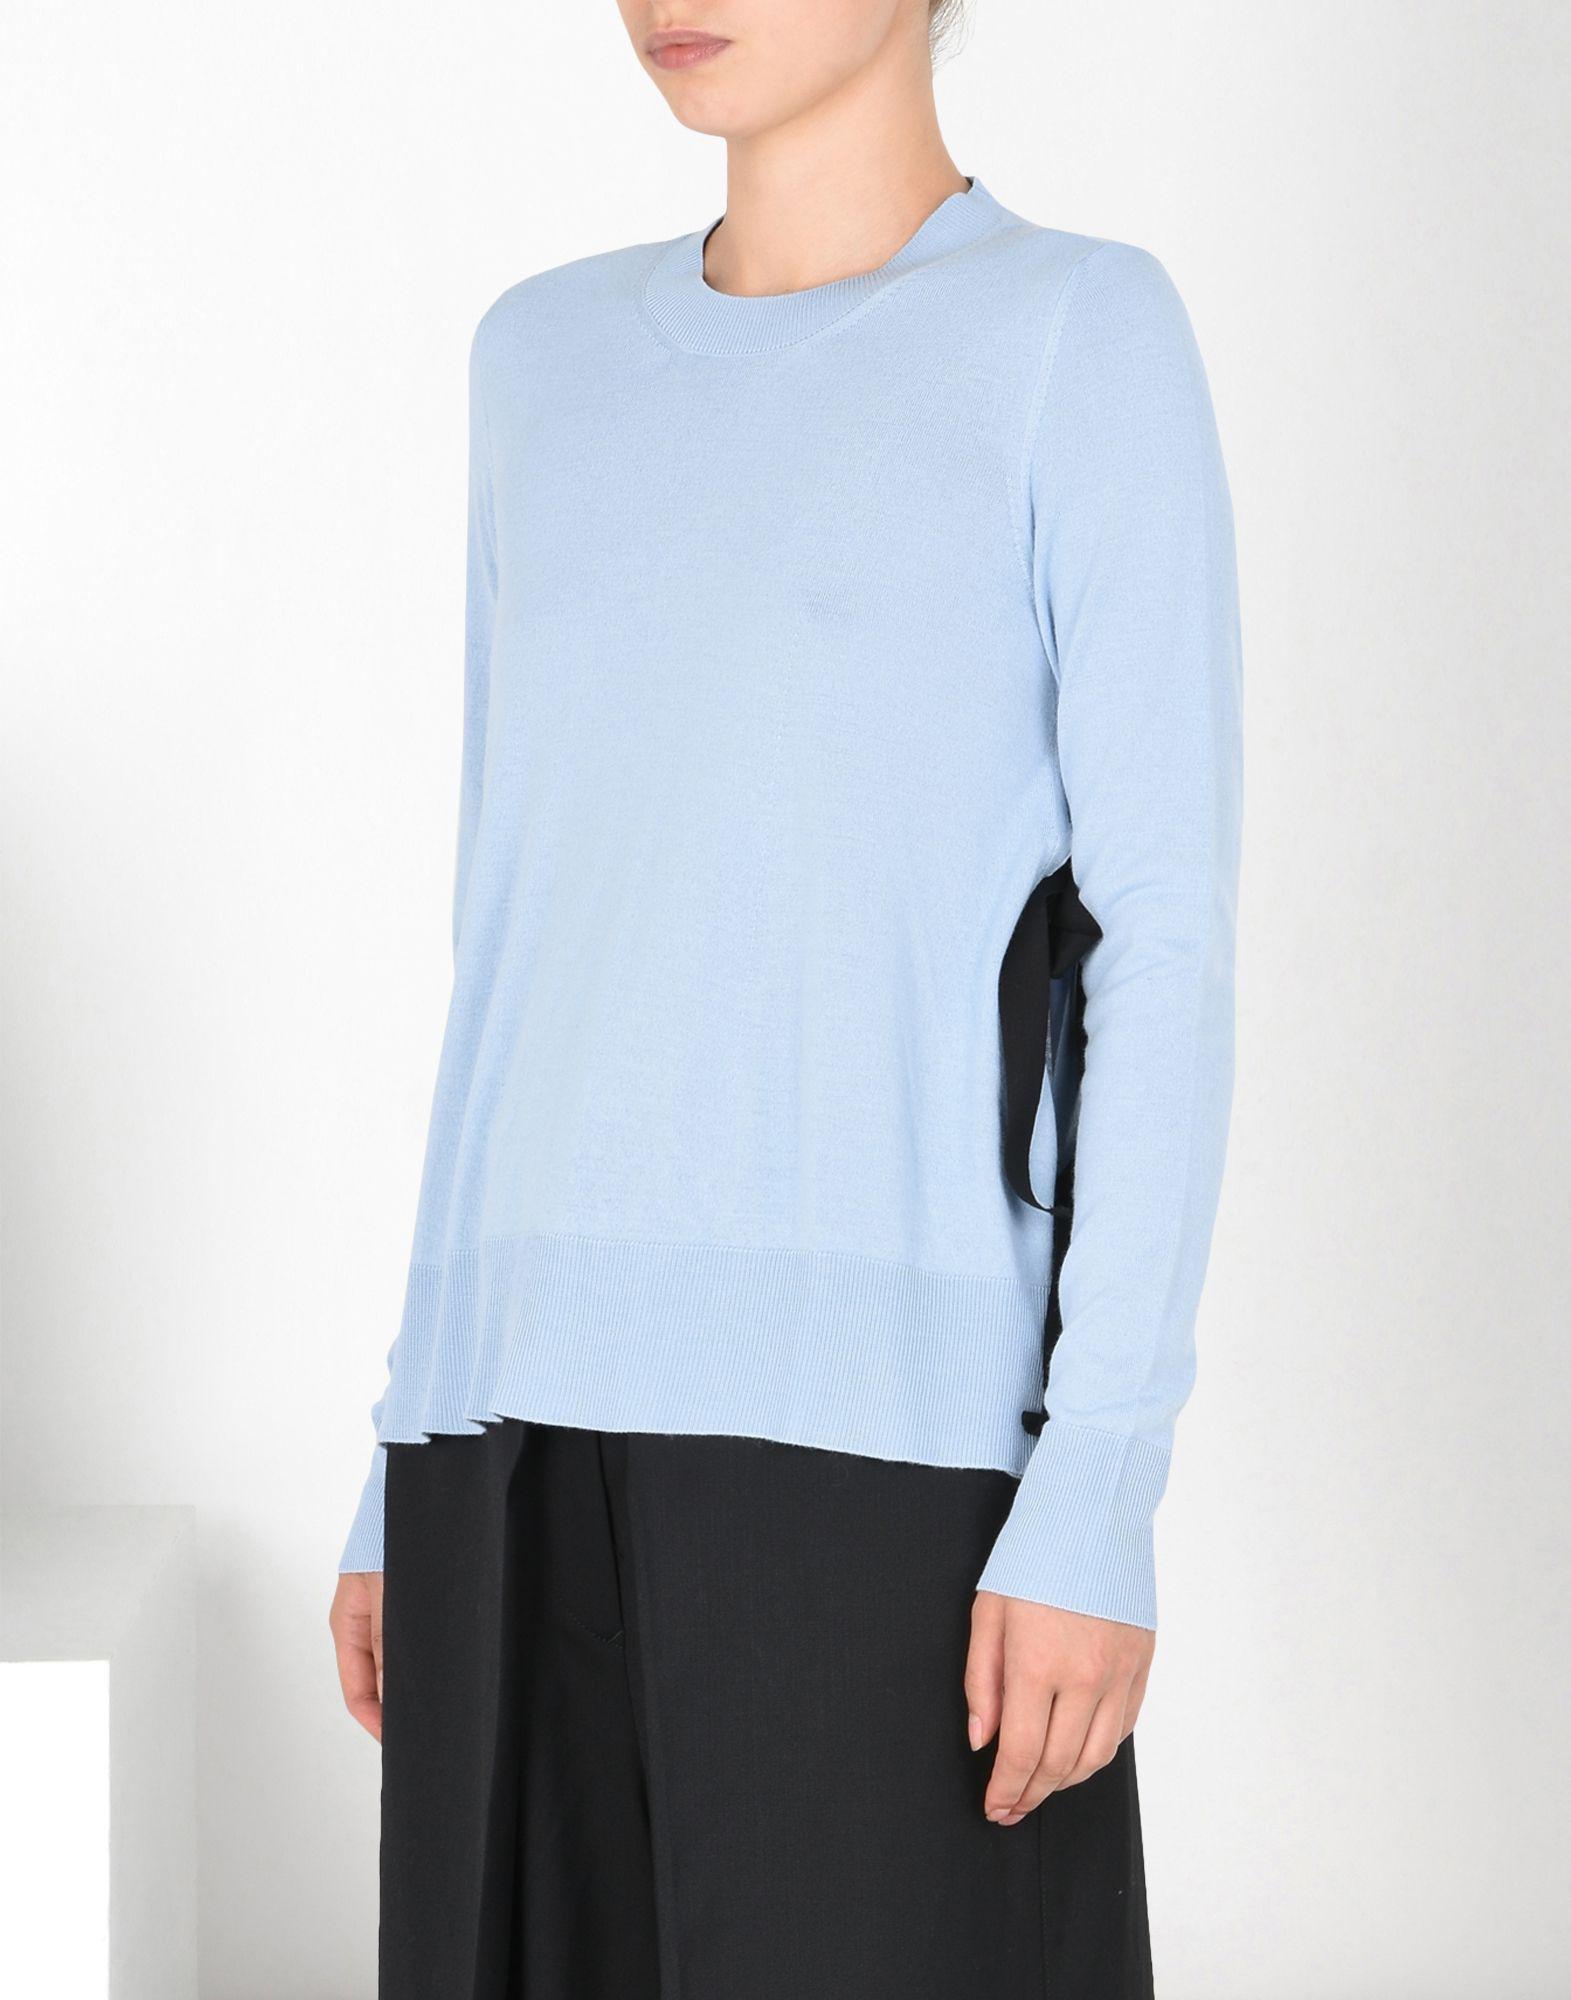 Mm6 By Maison Margiela Woman Cotton-jersey Top Ecru Size L Maison Martin Margiela Buy Cheap Reliable Free Shipping Shop Offer Discount Brand New Unisex Official Site Online Cheap Fashionable sCKgmTFH